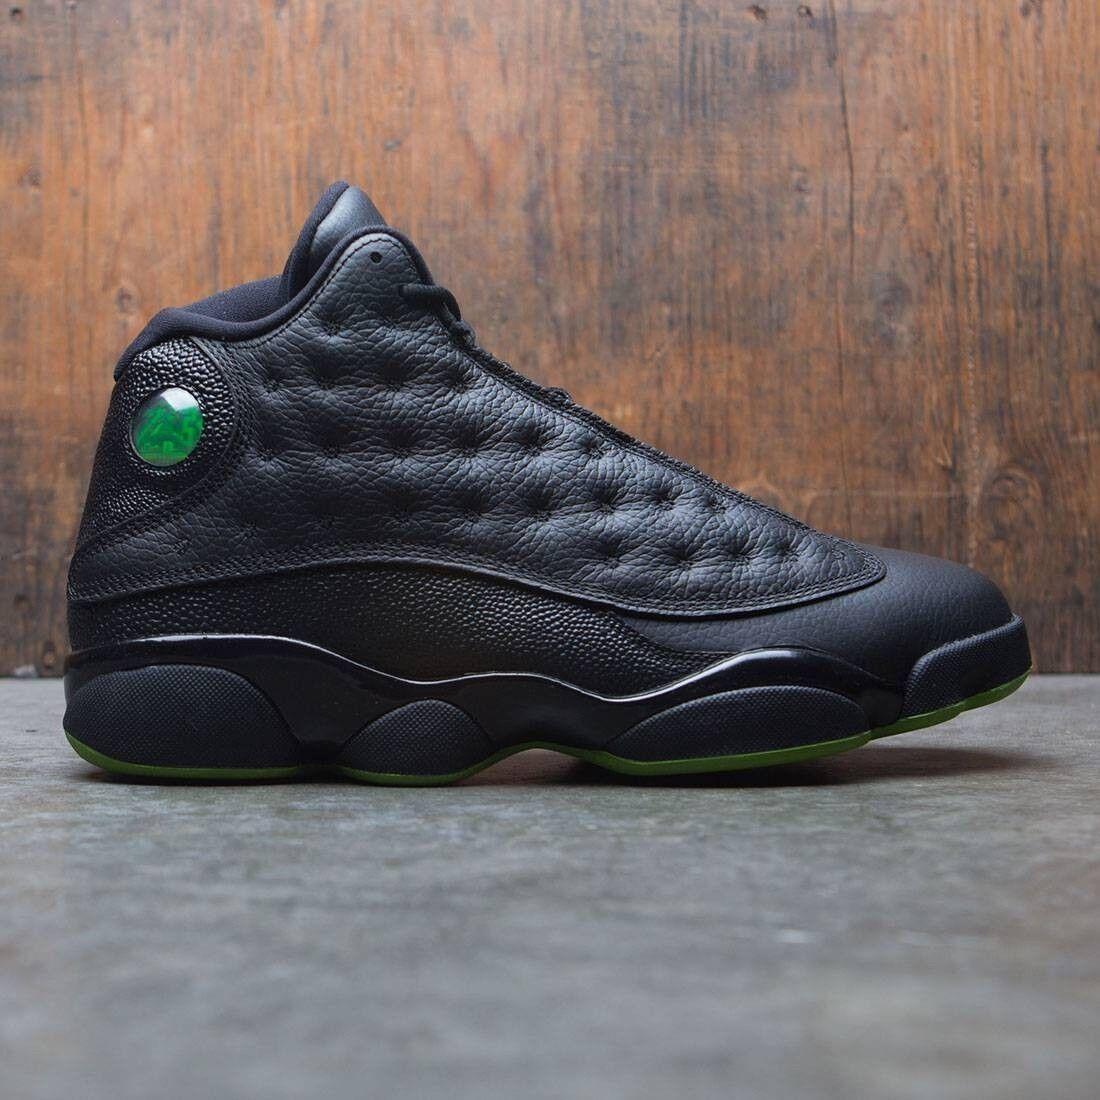 Nike air jordan 13 xiii retrò altitudine nero - verde taglia 414571-042